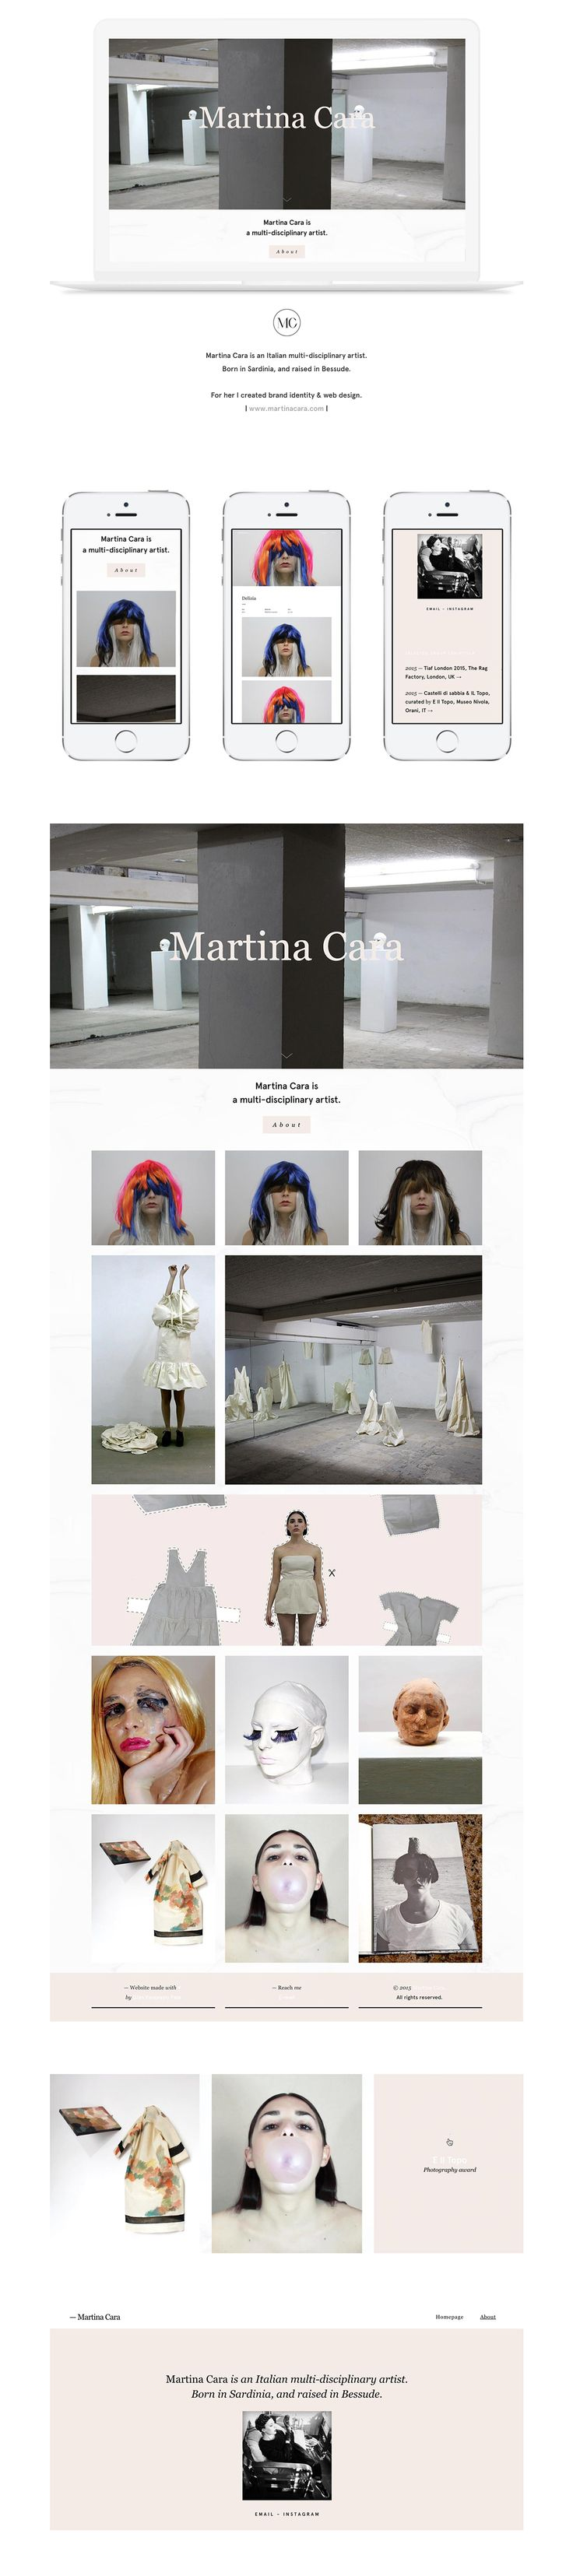 Martina Cara | Portfolio on Behance